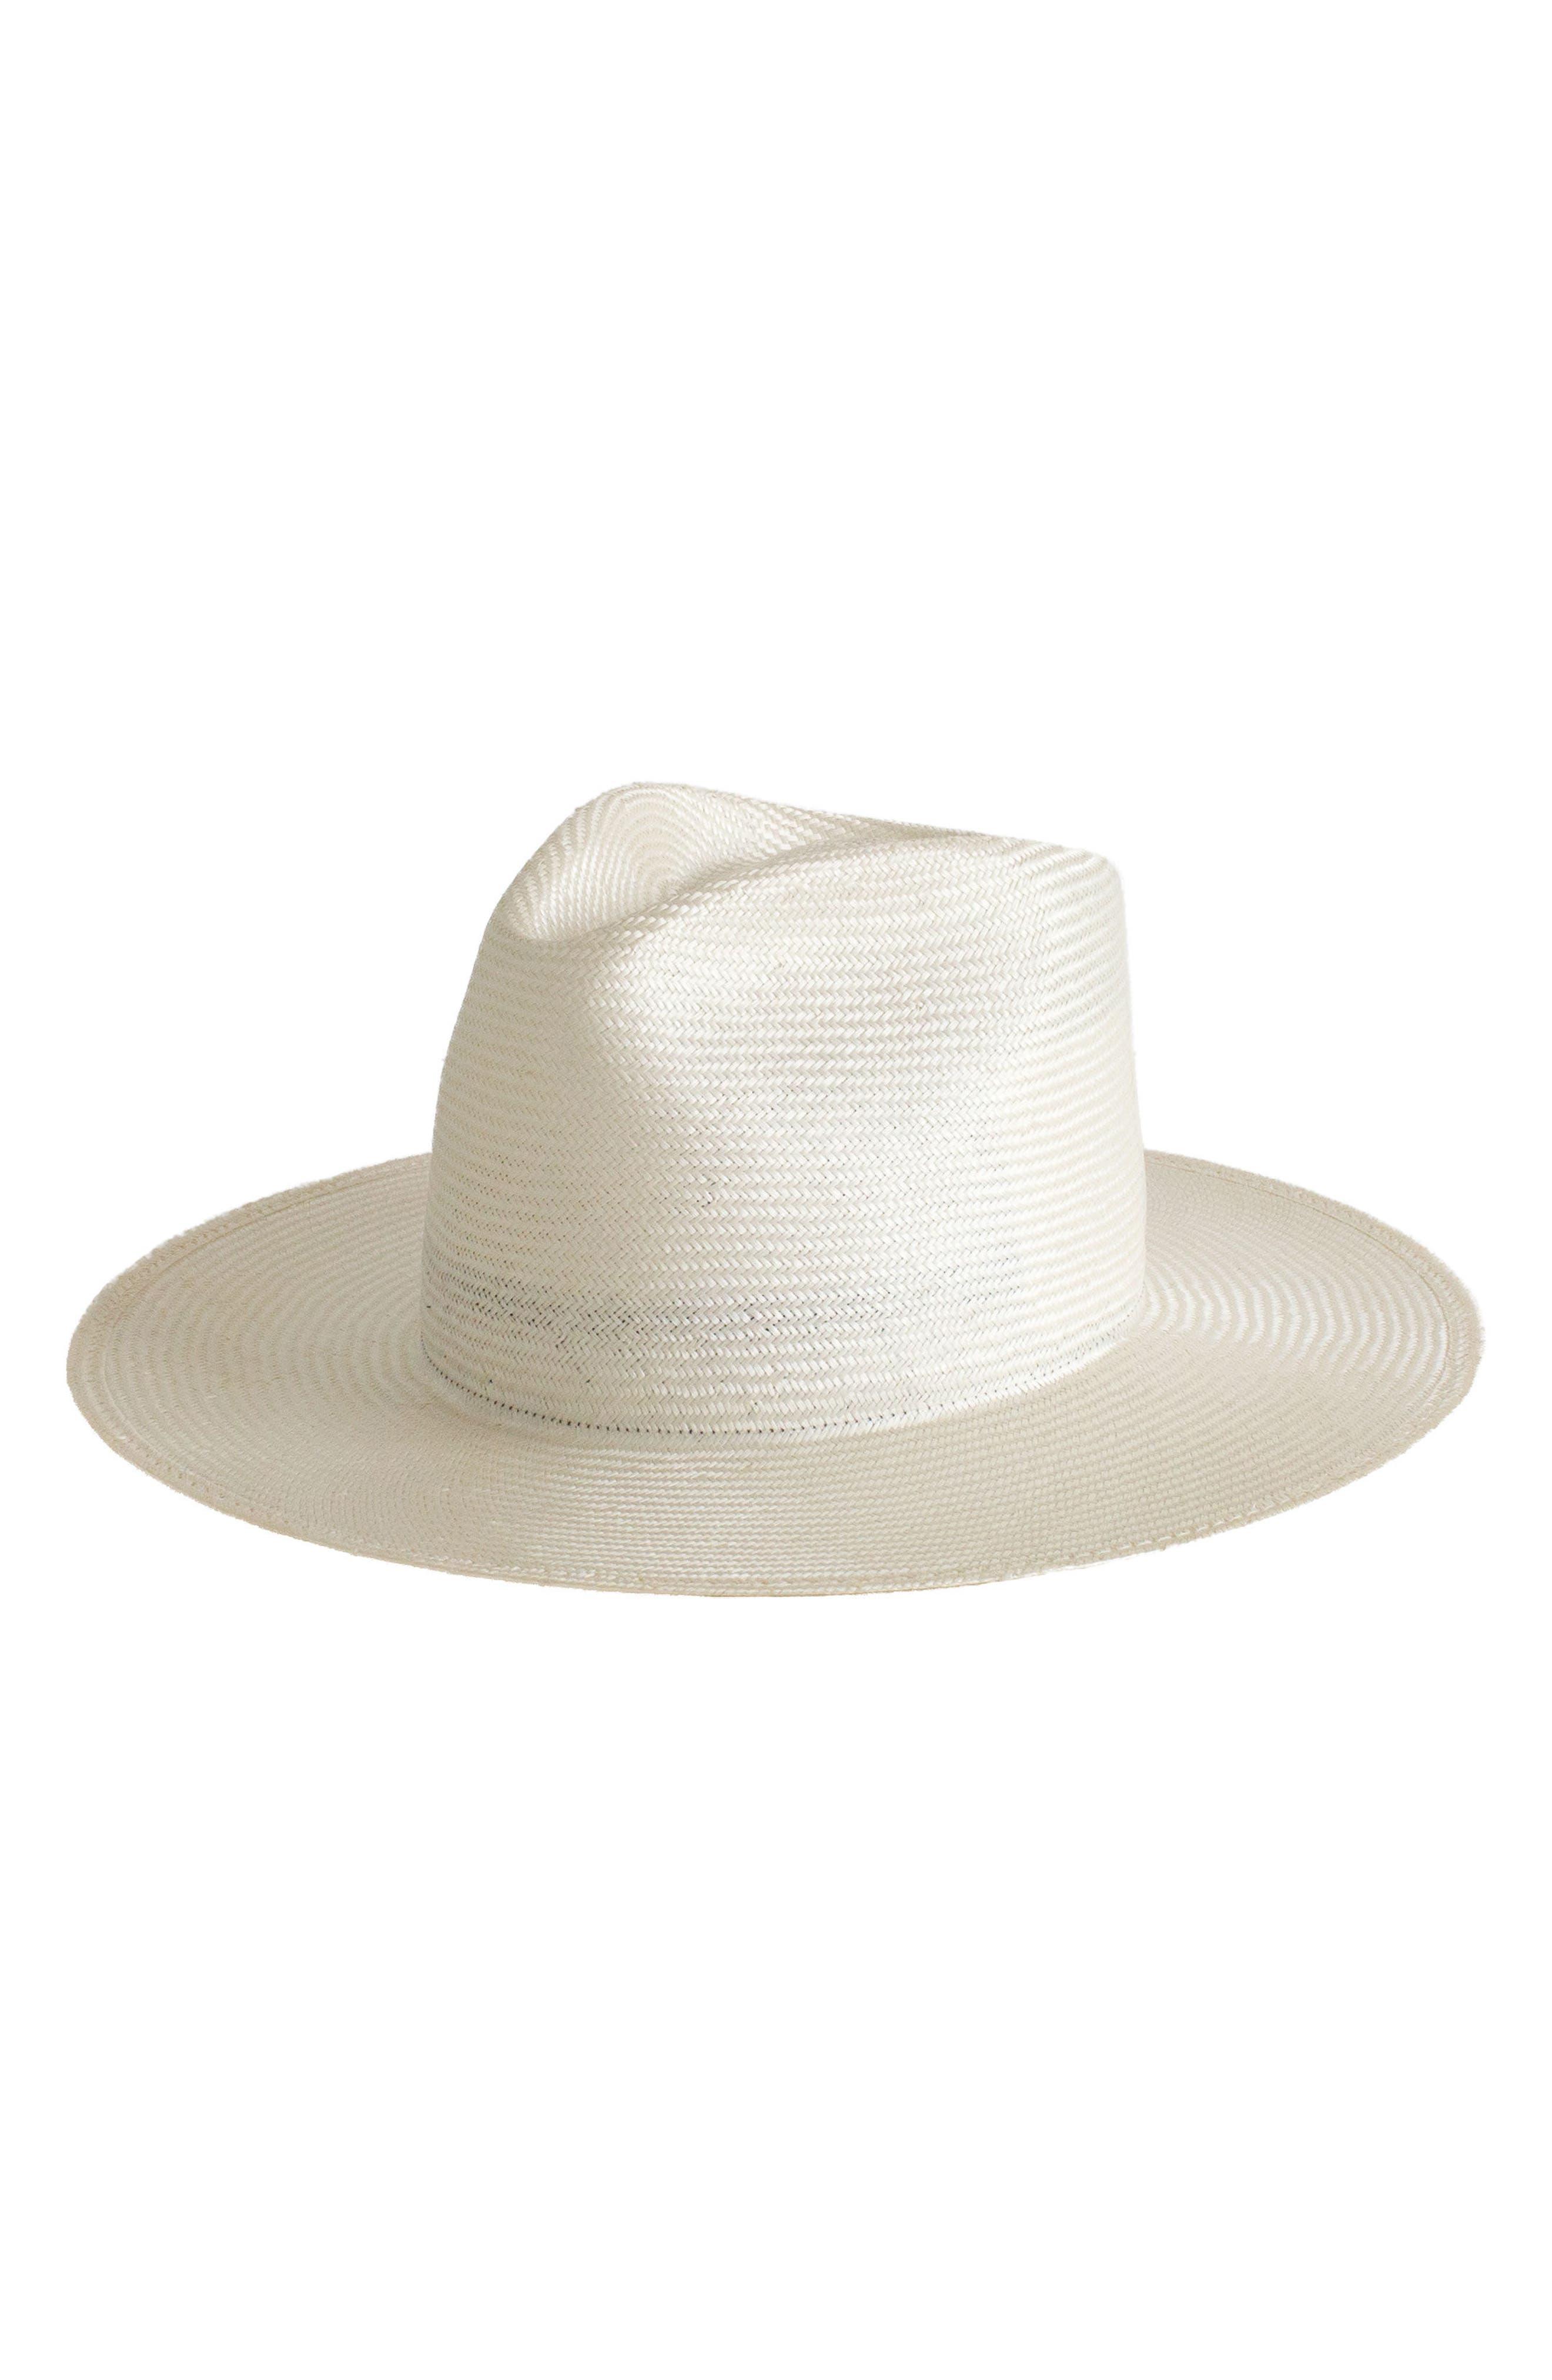 Alternate Image 1 Selected - Janessa Leone Alexander Straw Hat